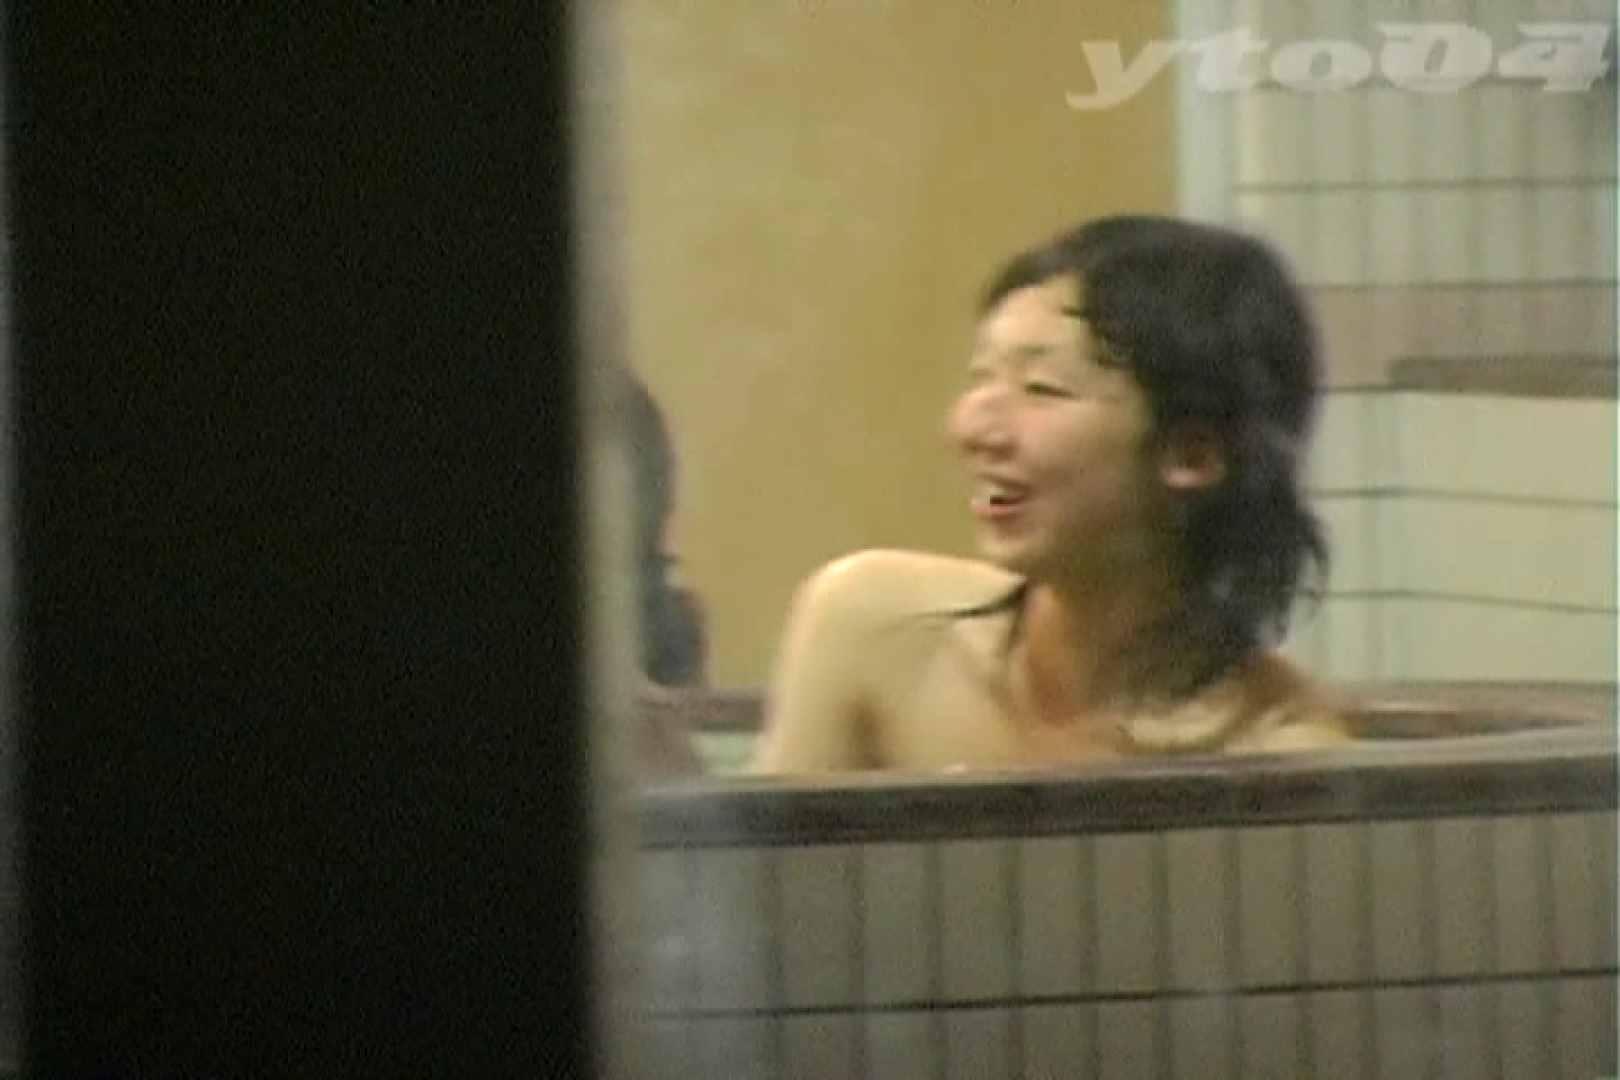 ▲復活限定▲合宿ホテル女風呂盗撮 Vol.24 名作  55pic 24